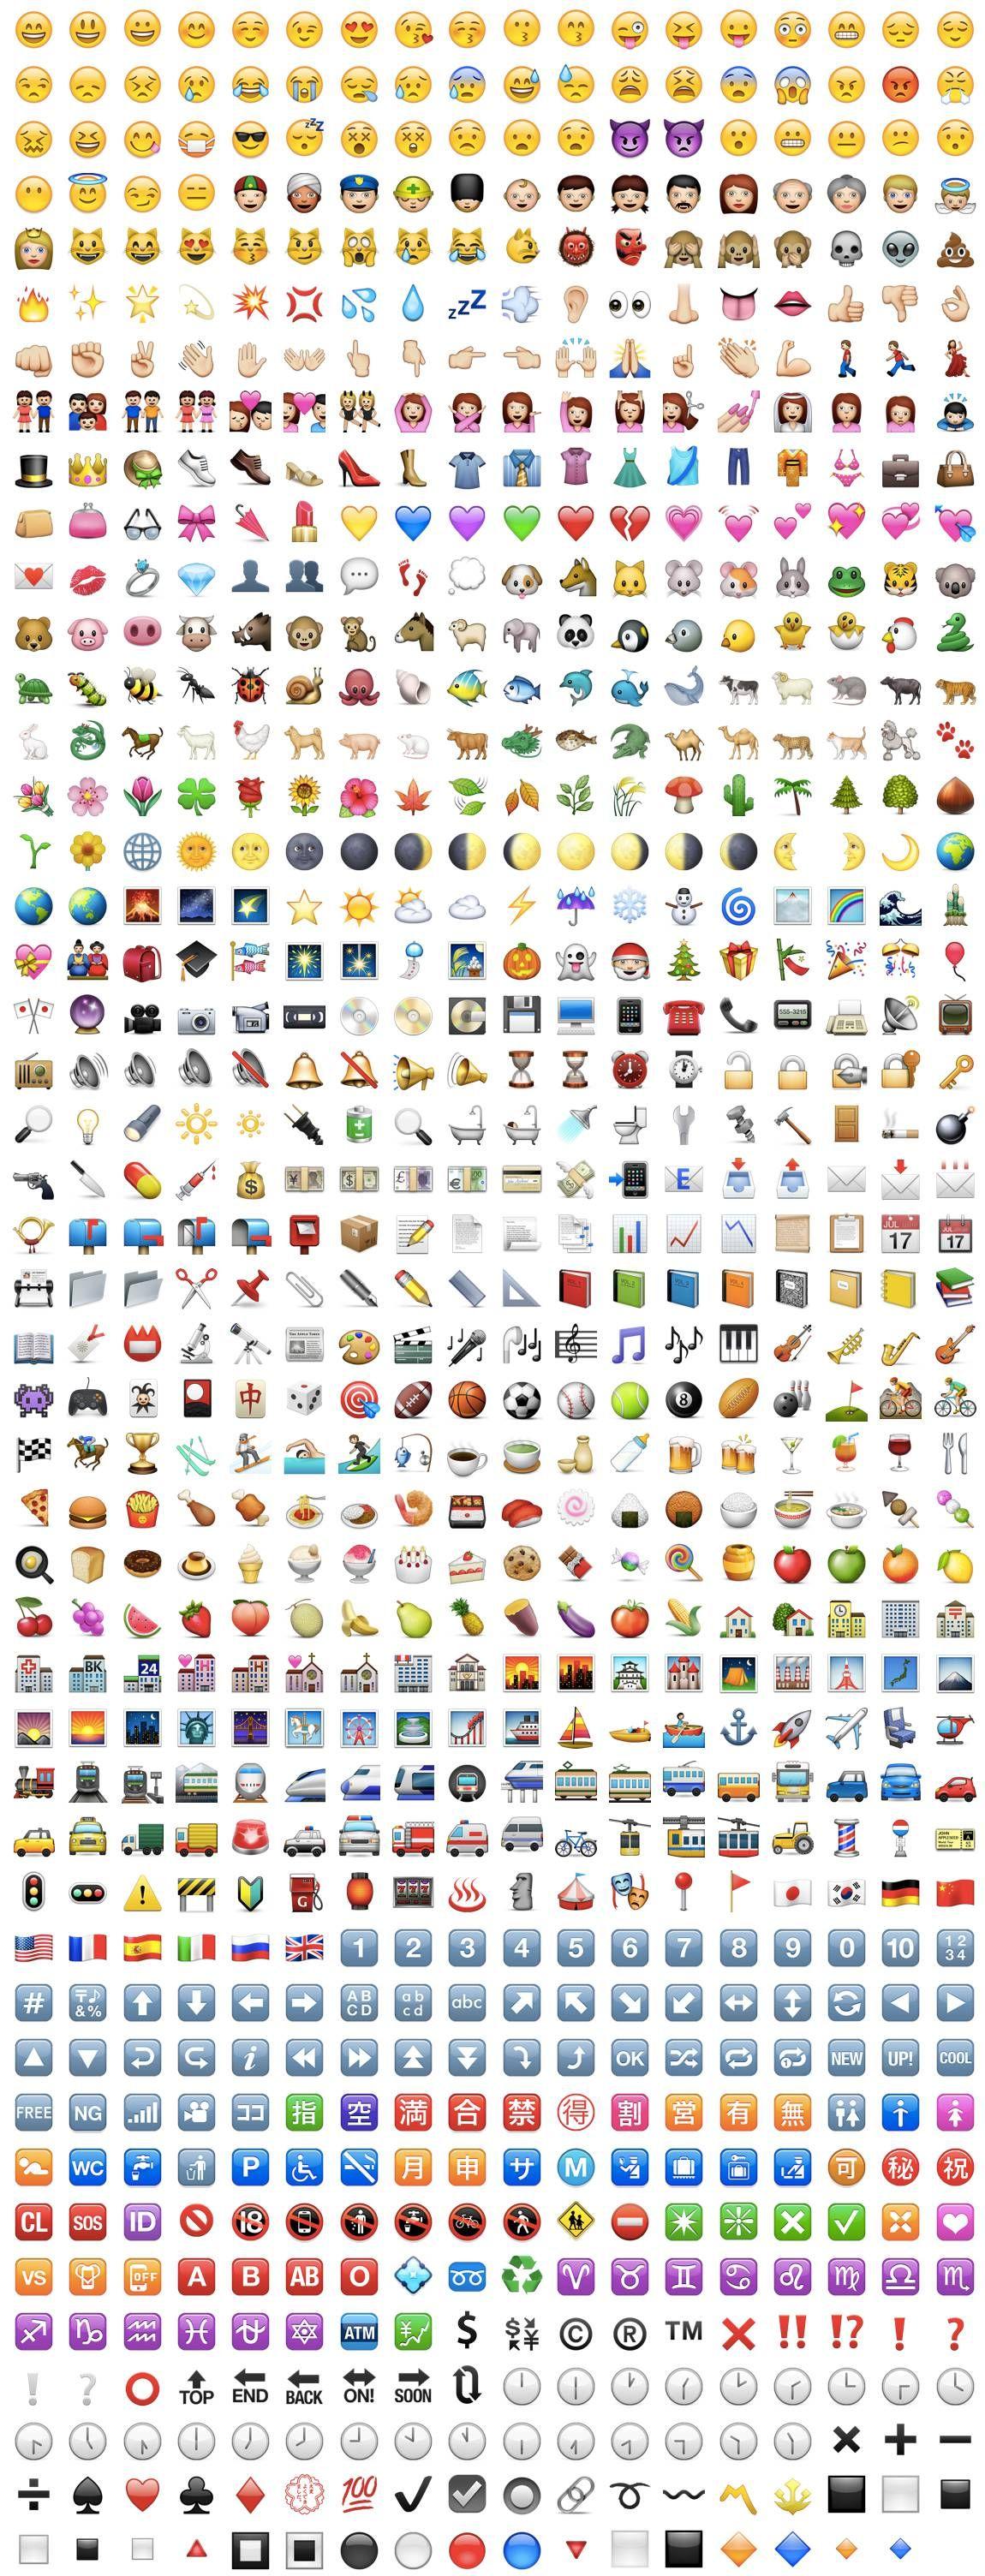 appleemoji What are some of them? (Understanding